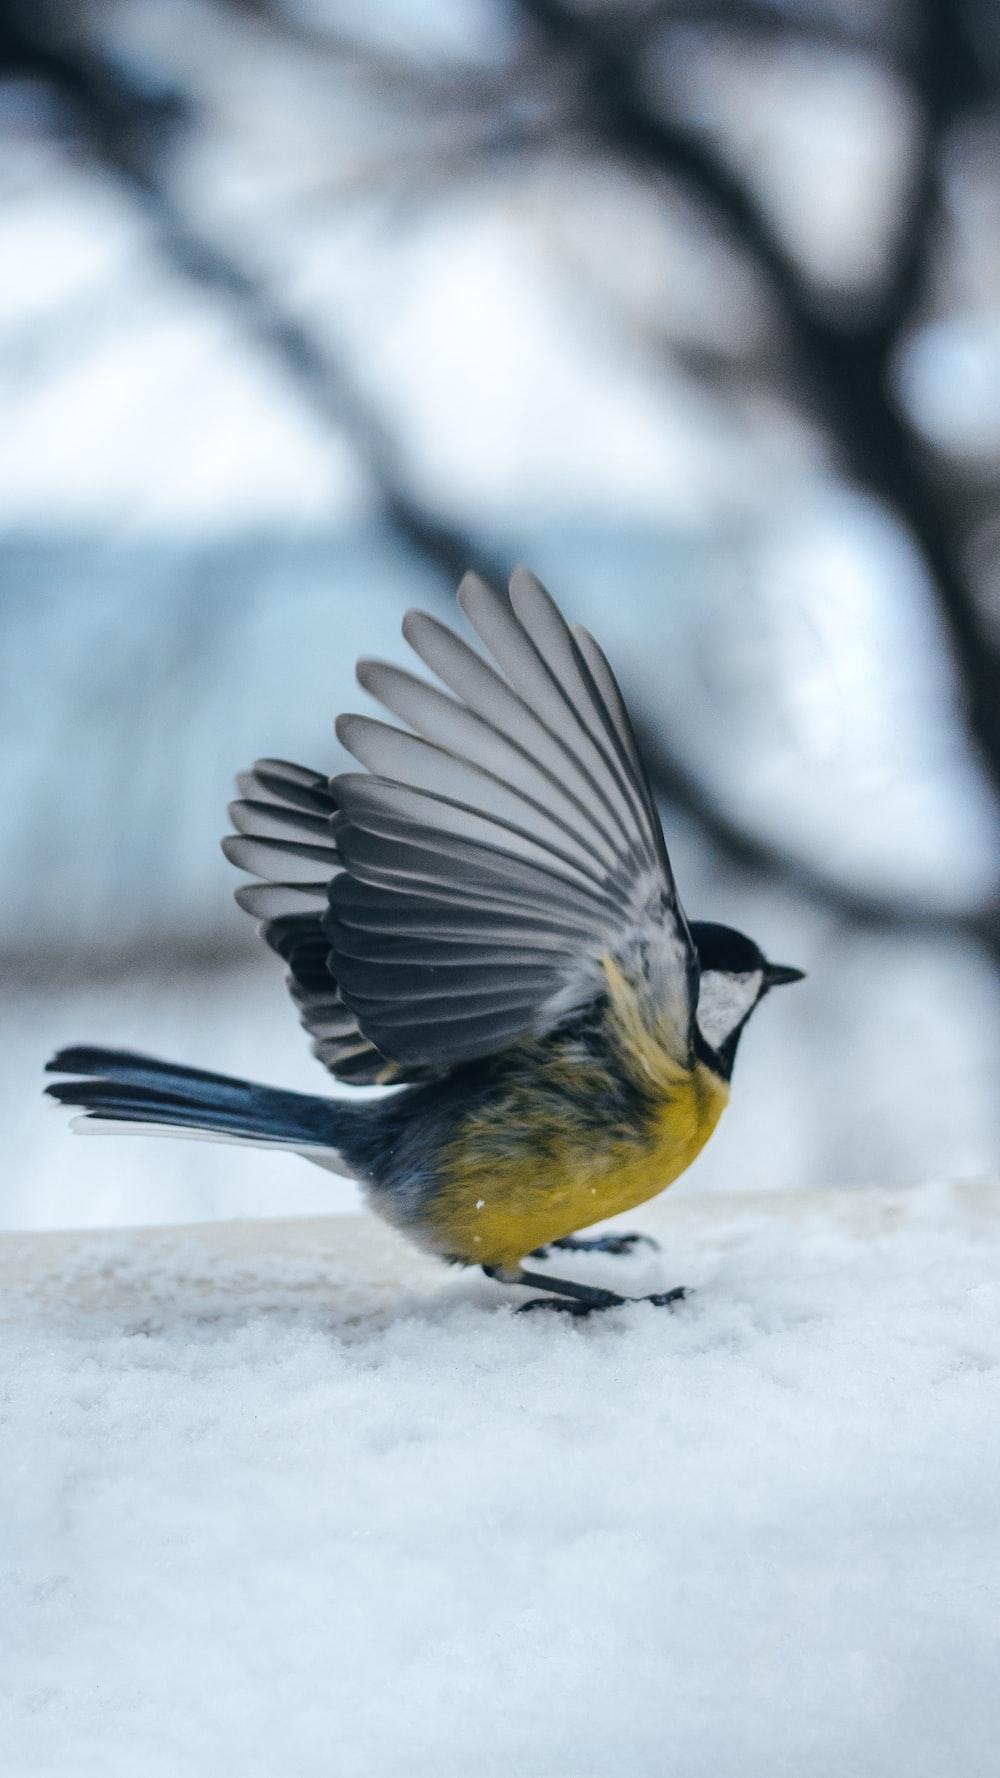 shallow focus photo of gray and yellow bird